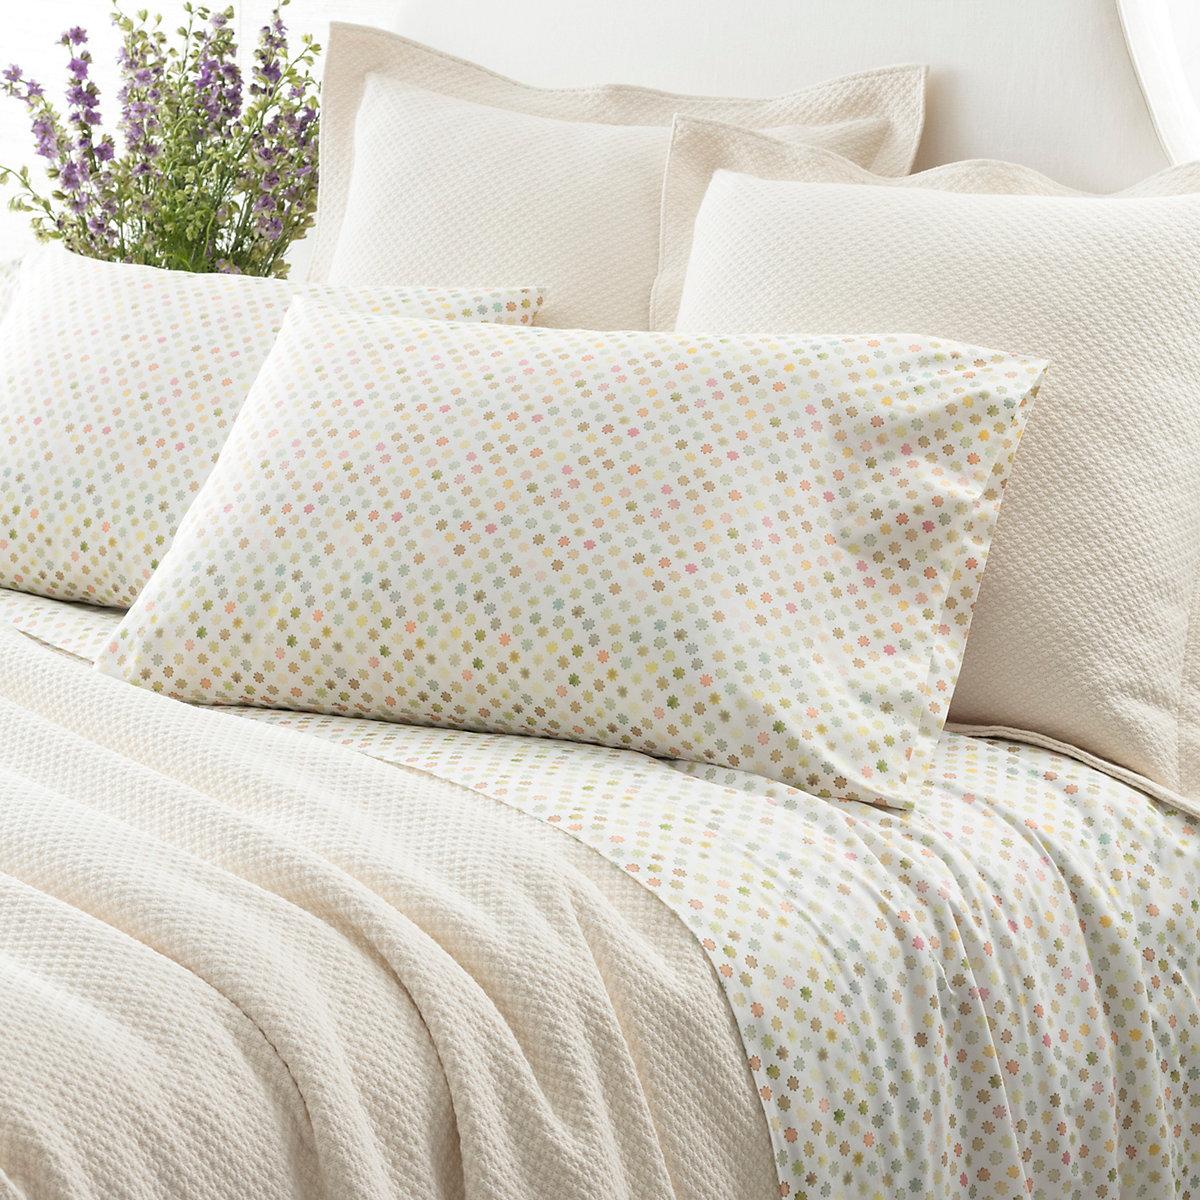 printed  patterned sheets  pine cone hill - watercolor dots sheet set